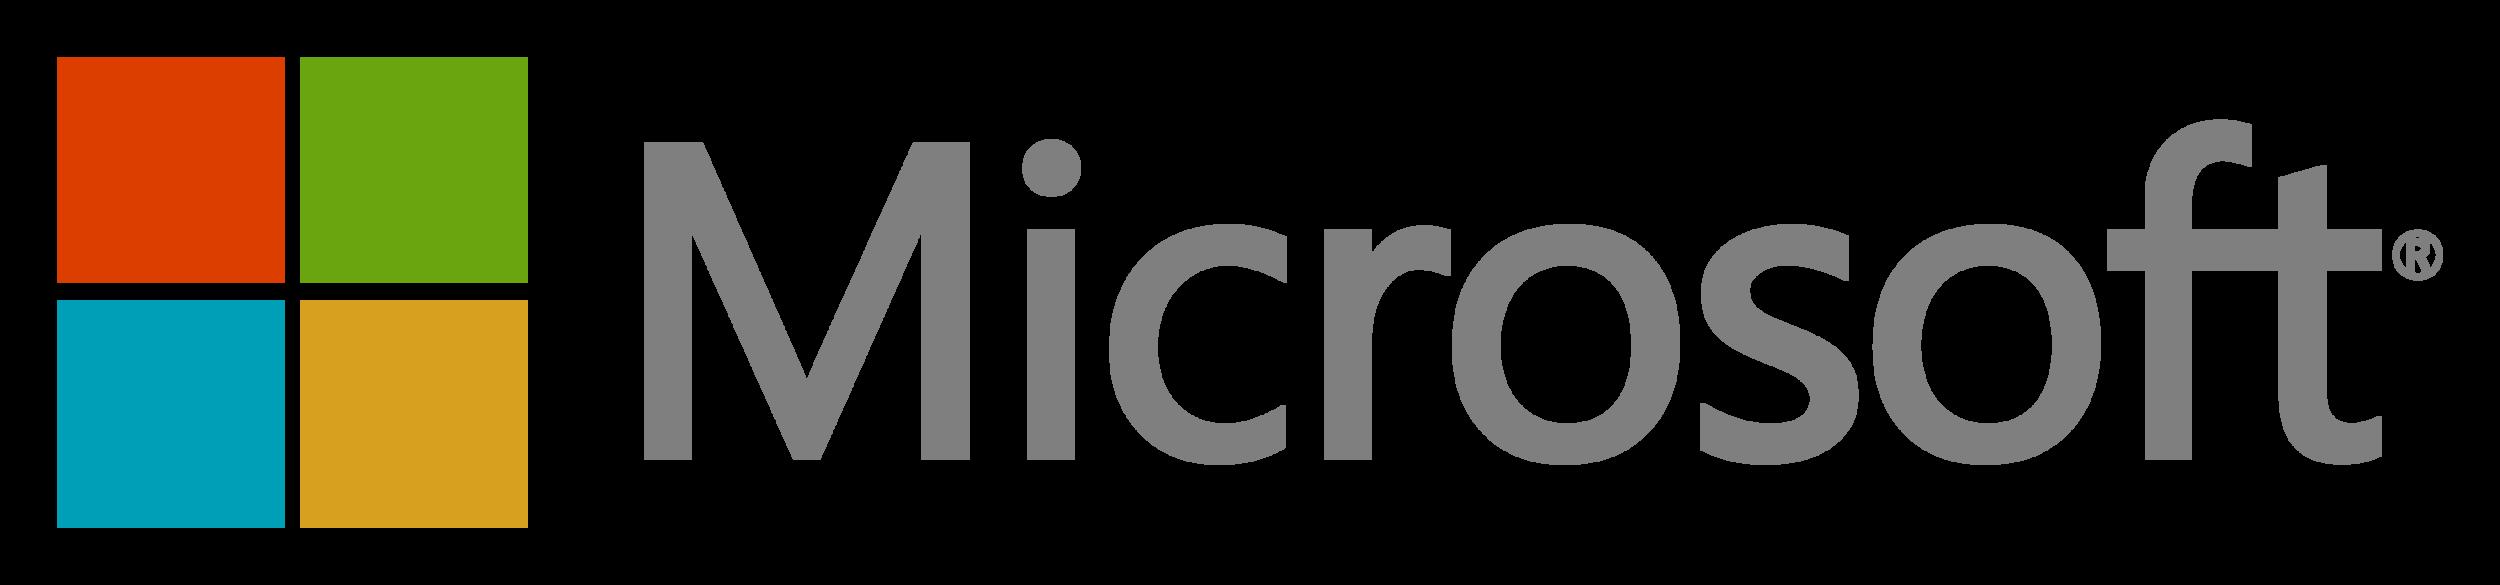 microsoft-png.png